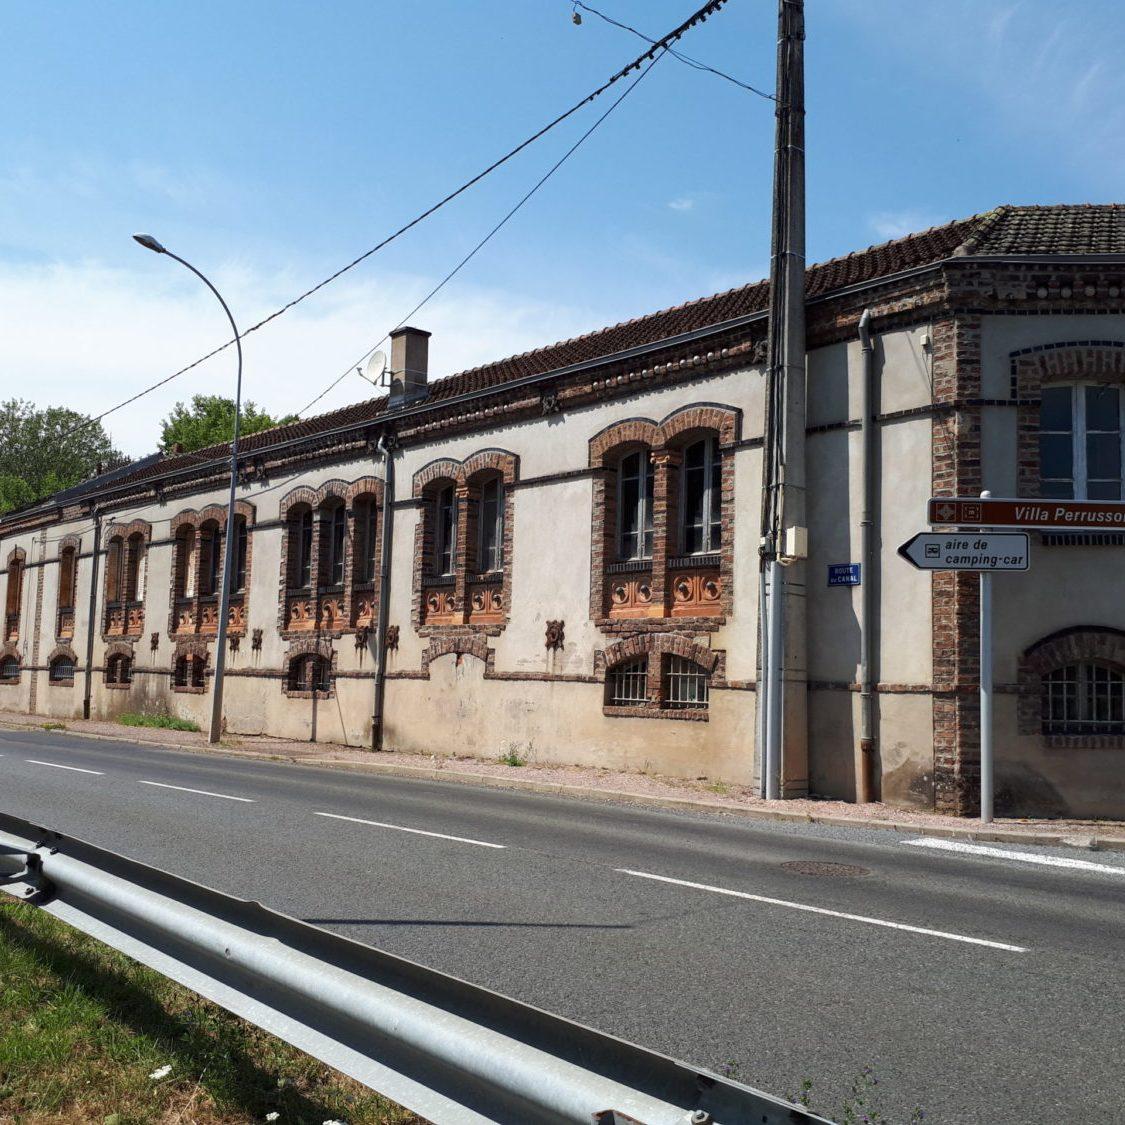 L'usine Perrusson